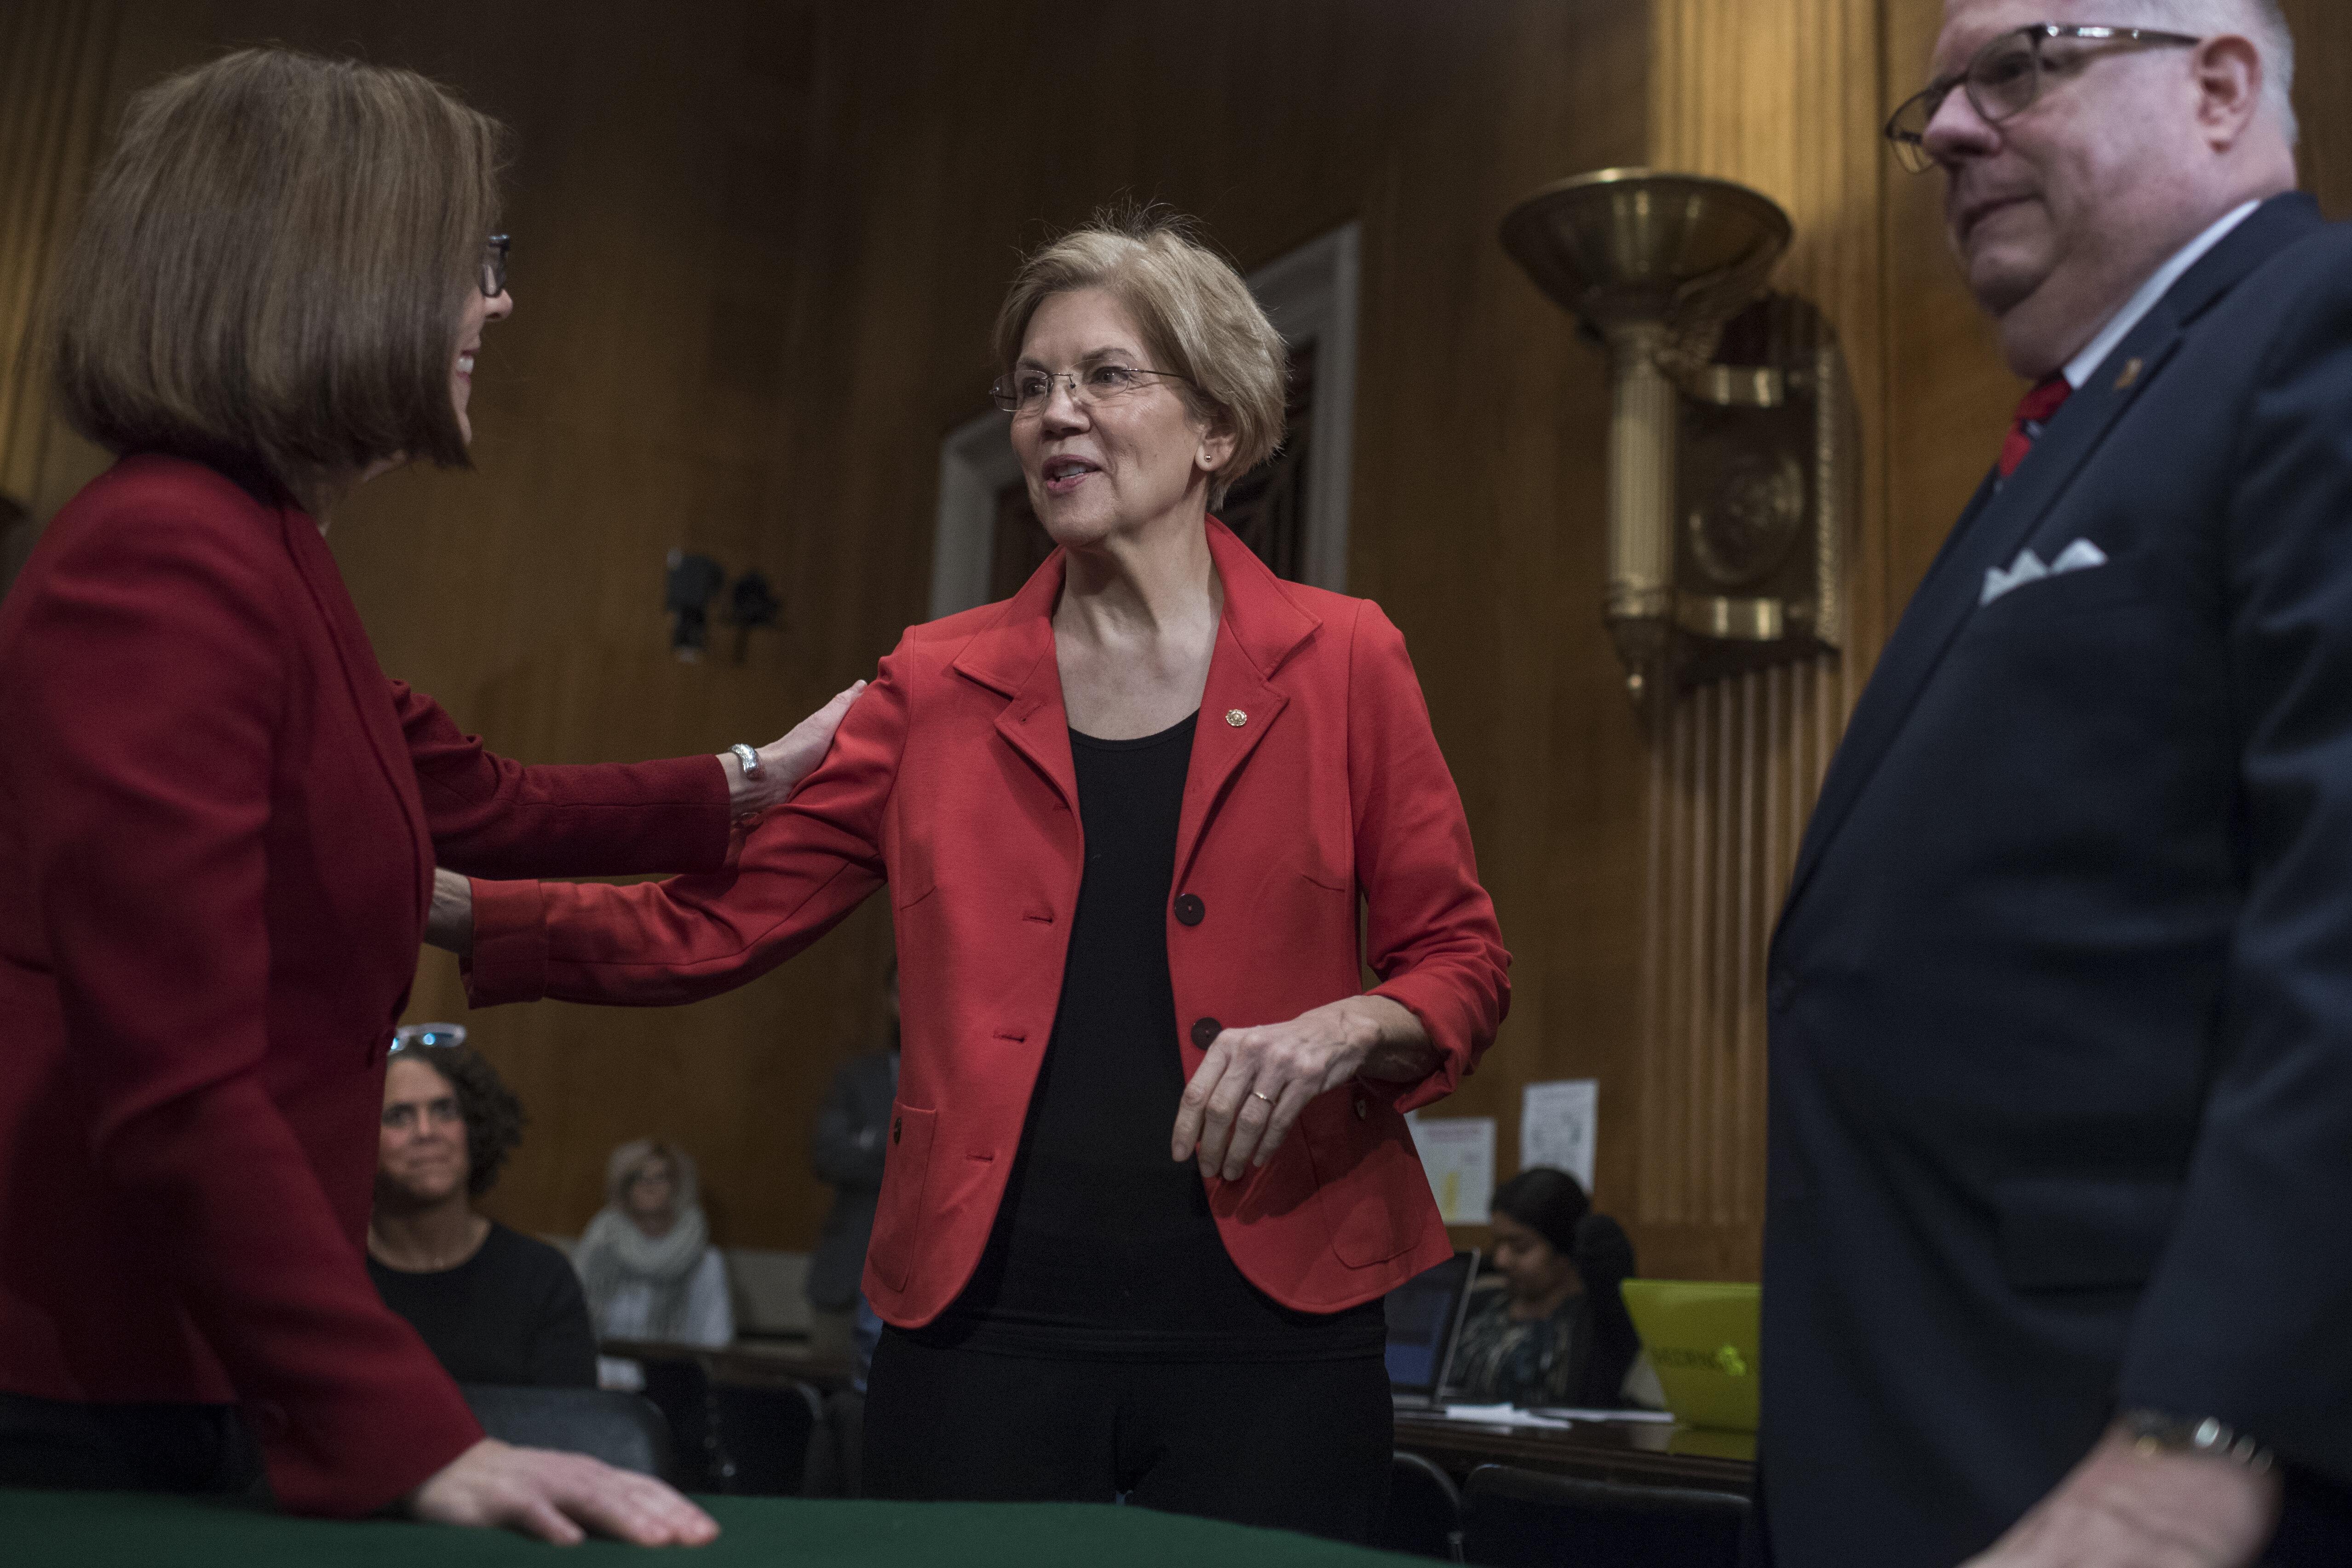 Sen. Elizabeth Warren (D-Mass.) has a plan to address the opioid epidemic that's based on legislation introduced last year.